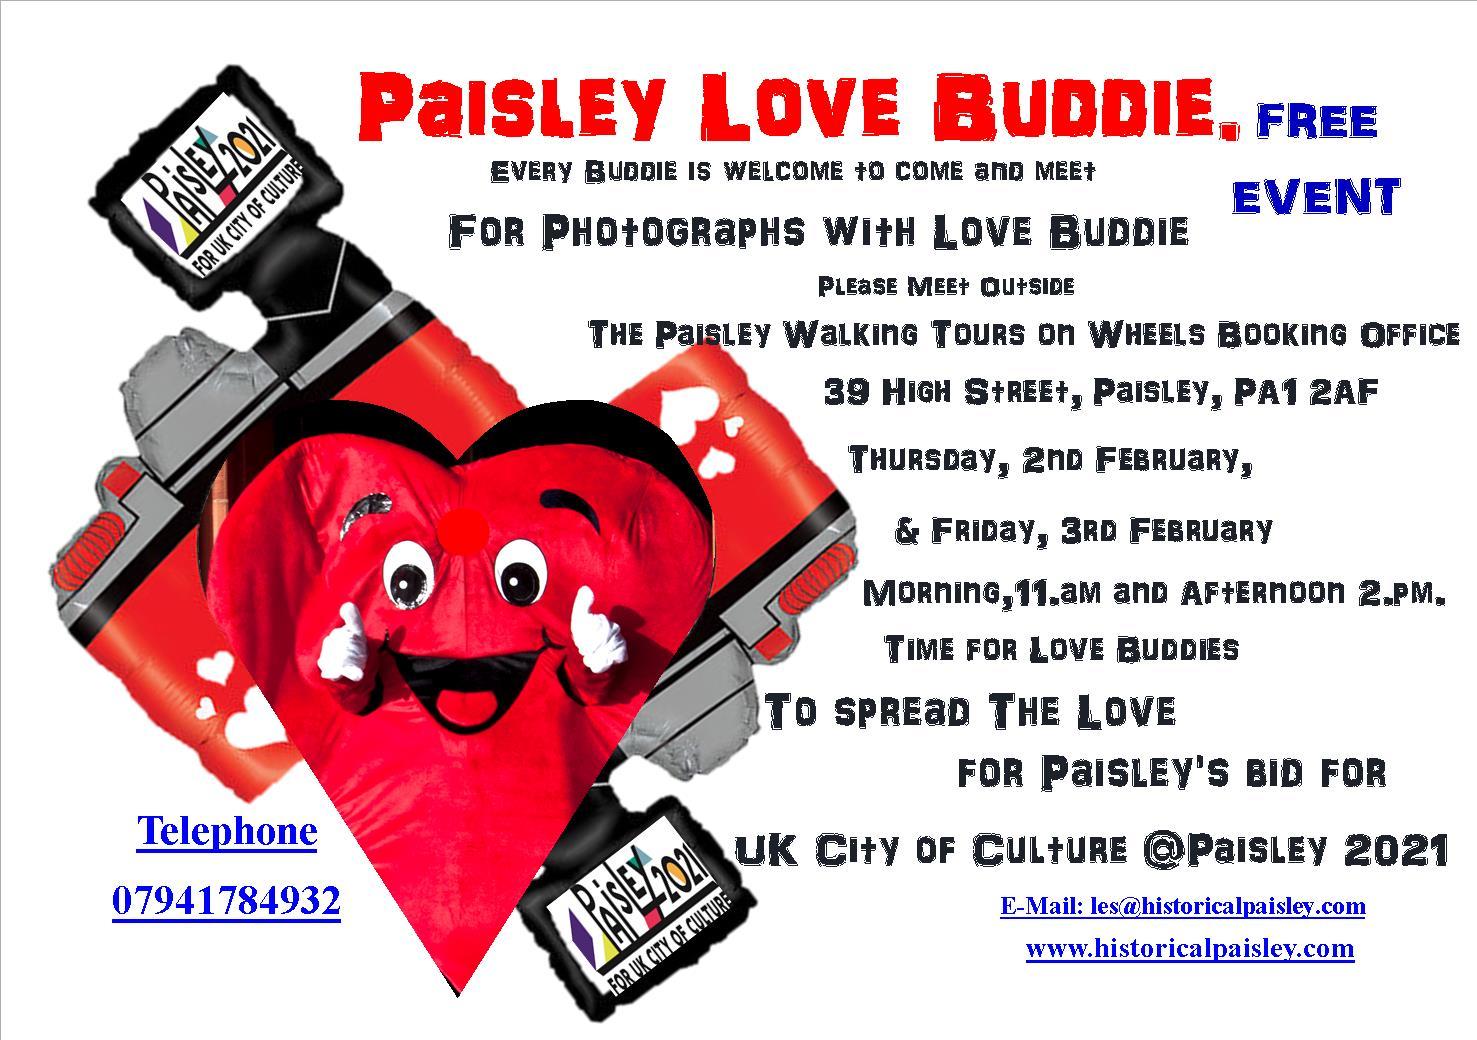 Paisley Love Buddie